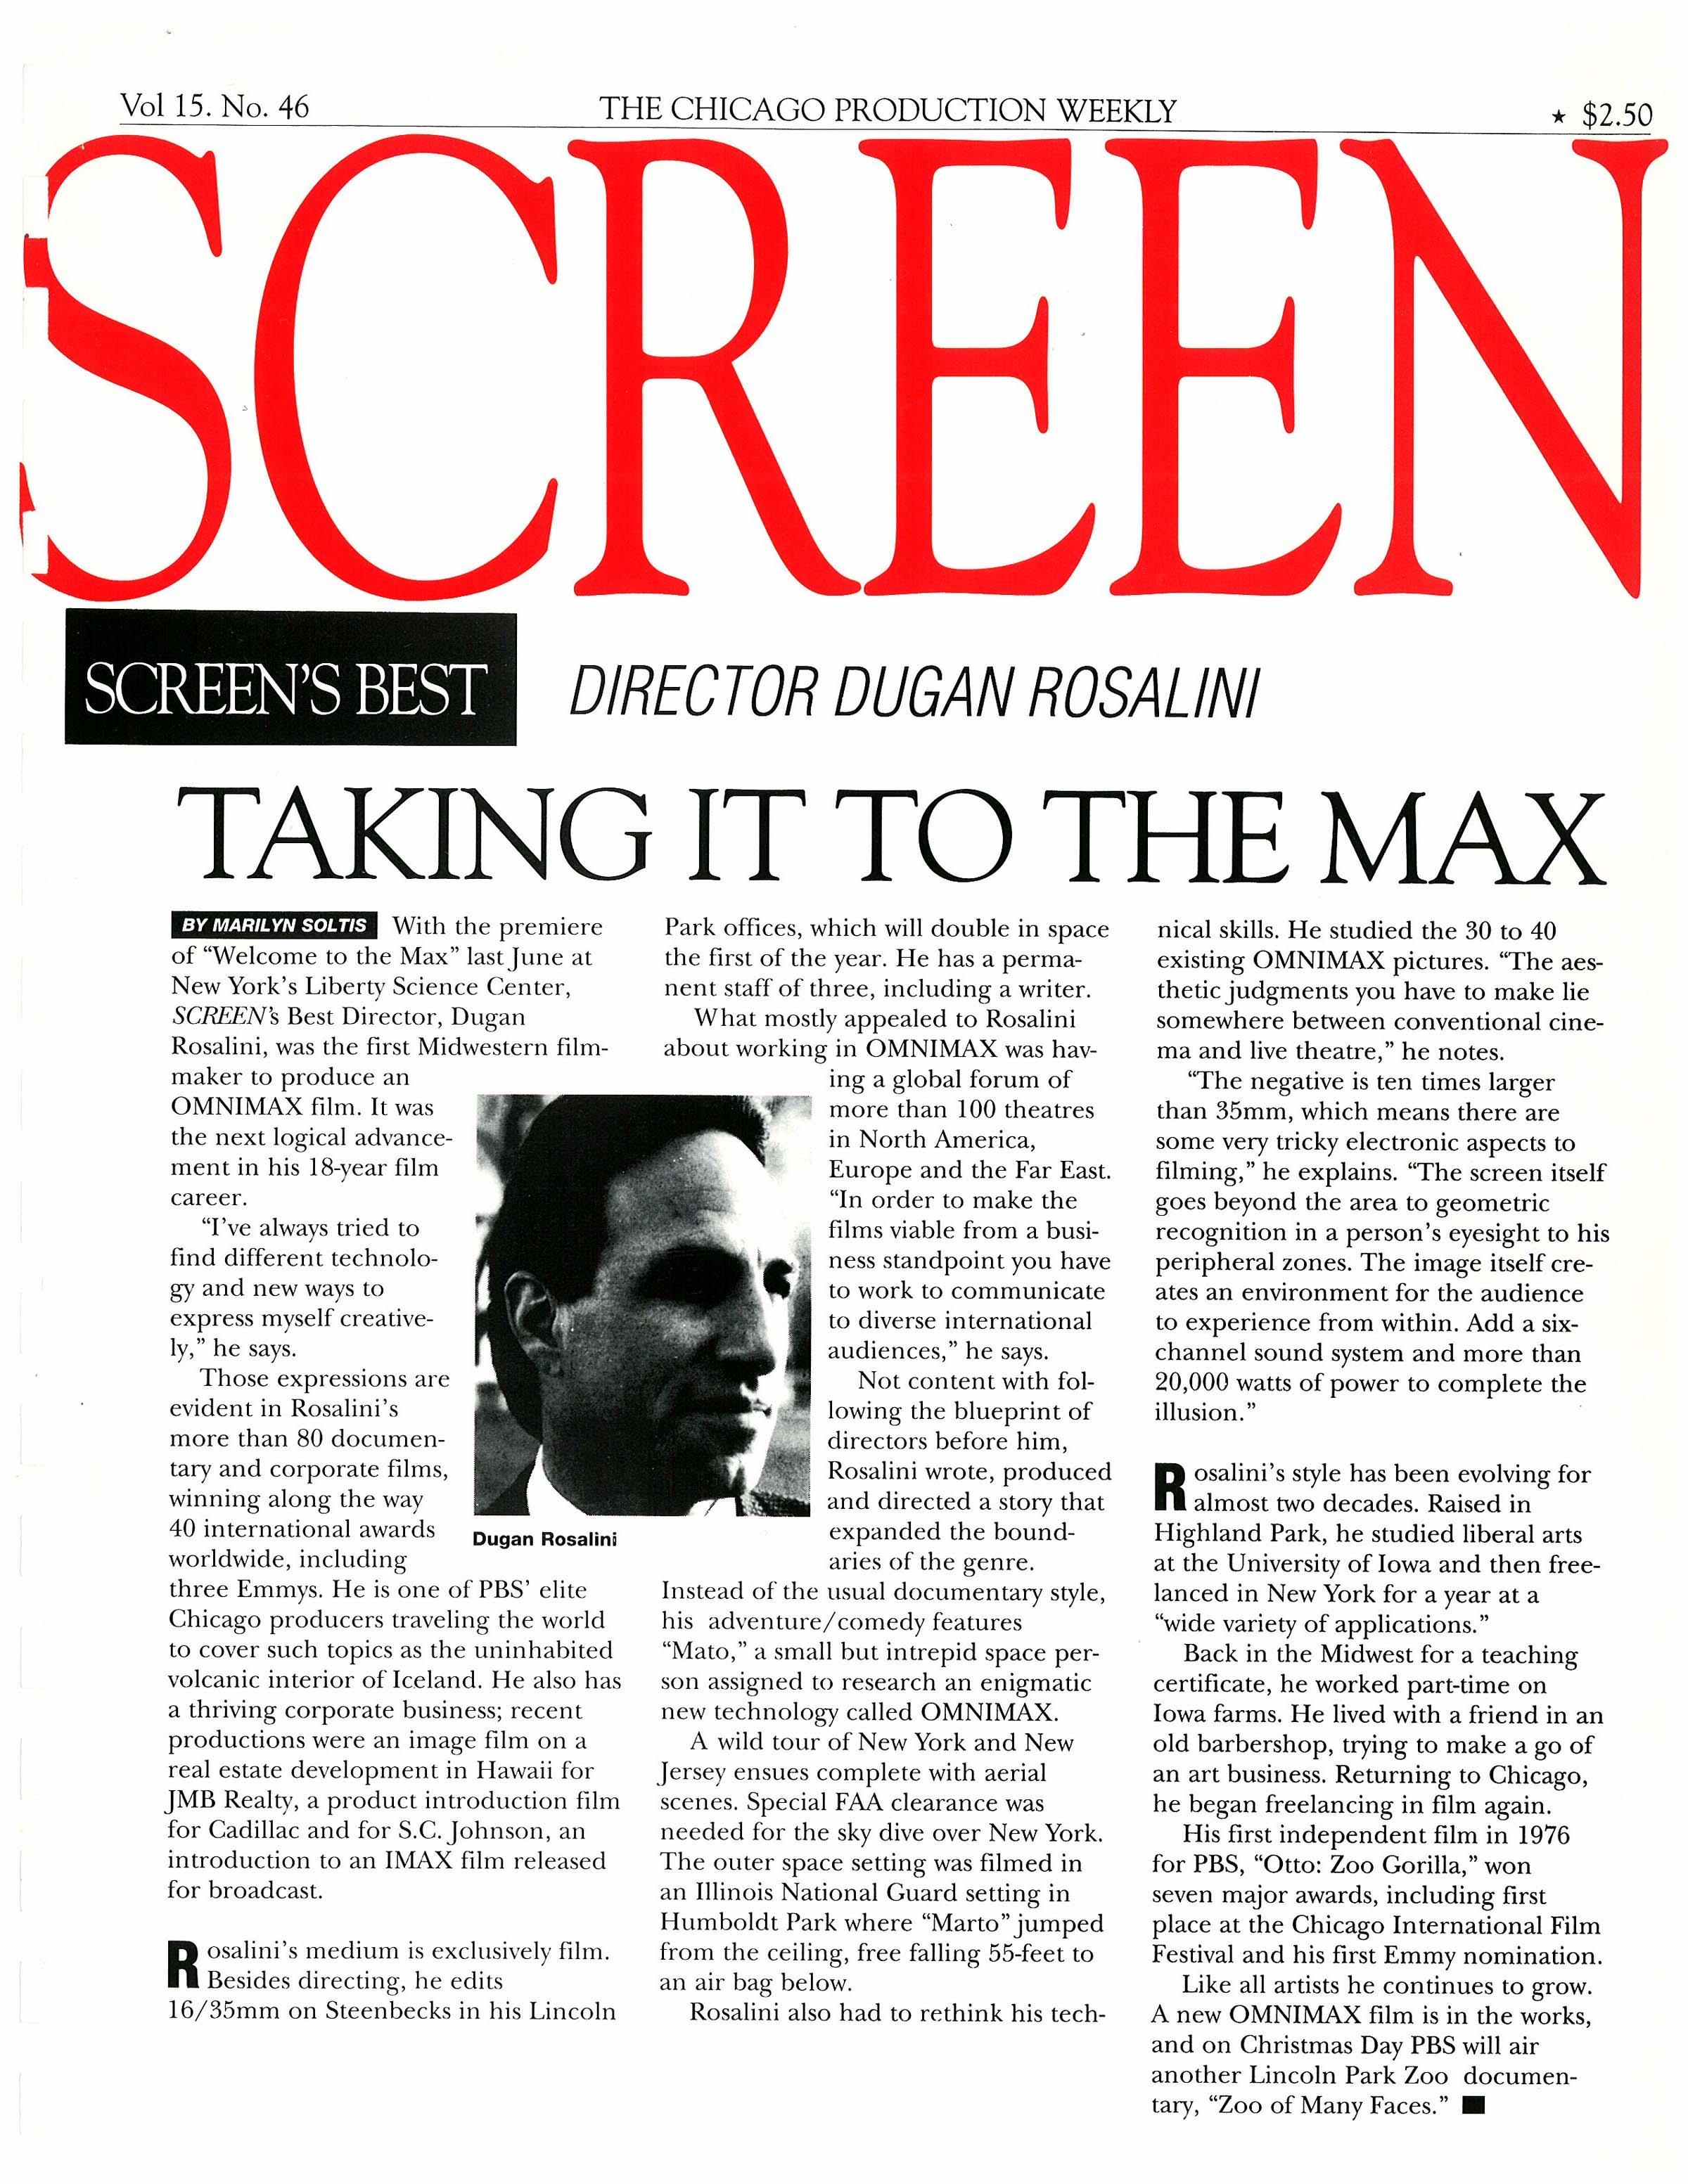 Screen Magazine_'Director of the Year' copy_2.jpg